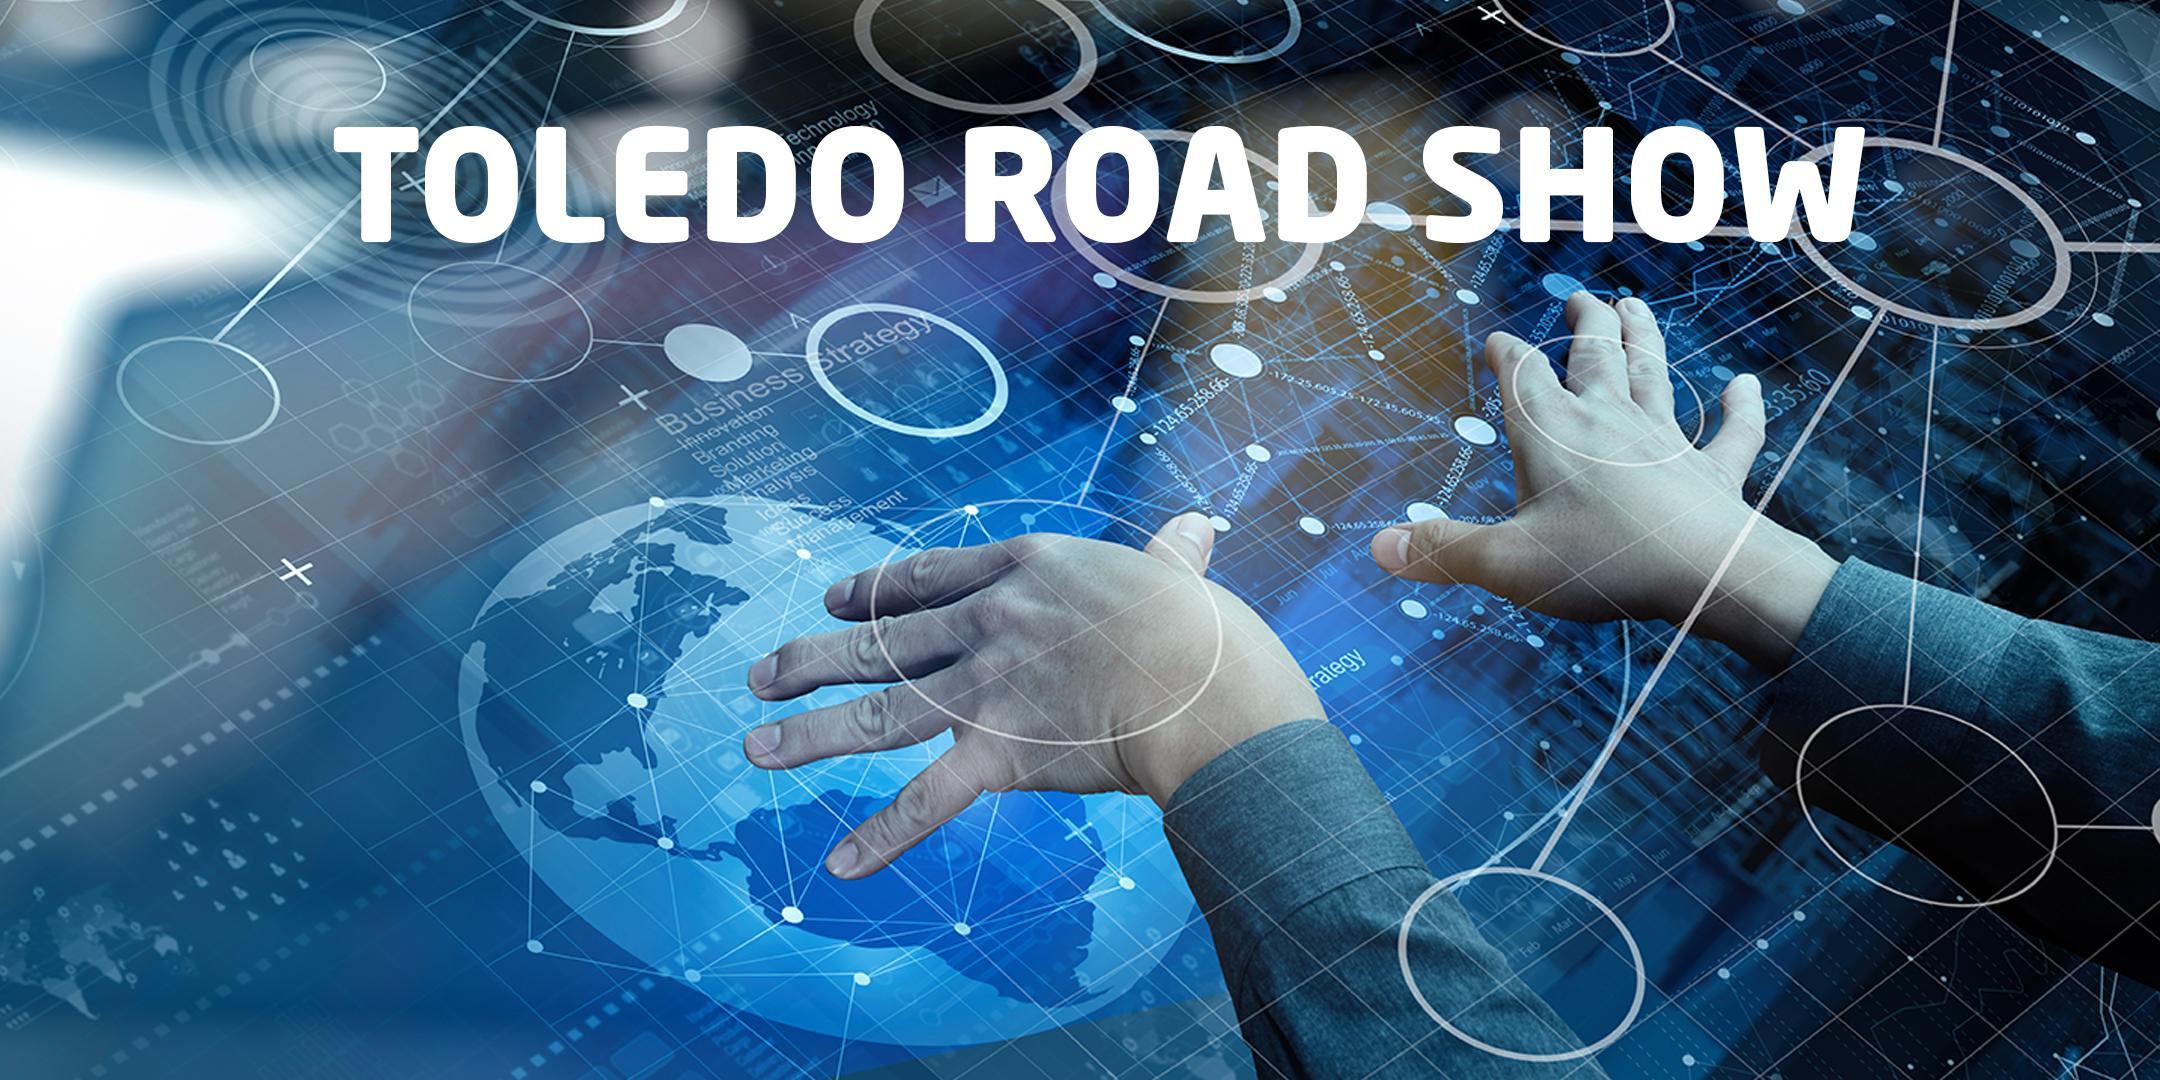 Toledo Road Show